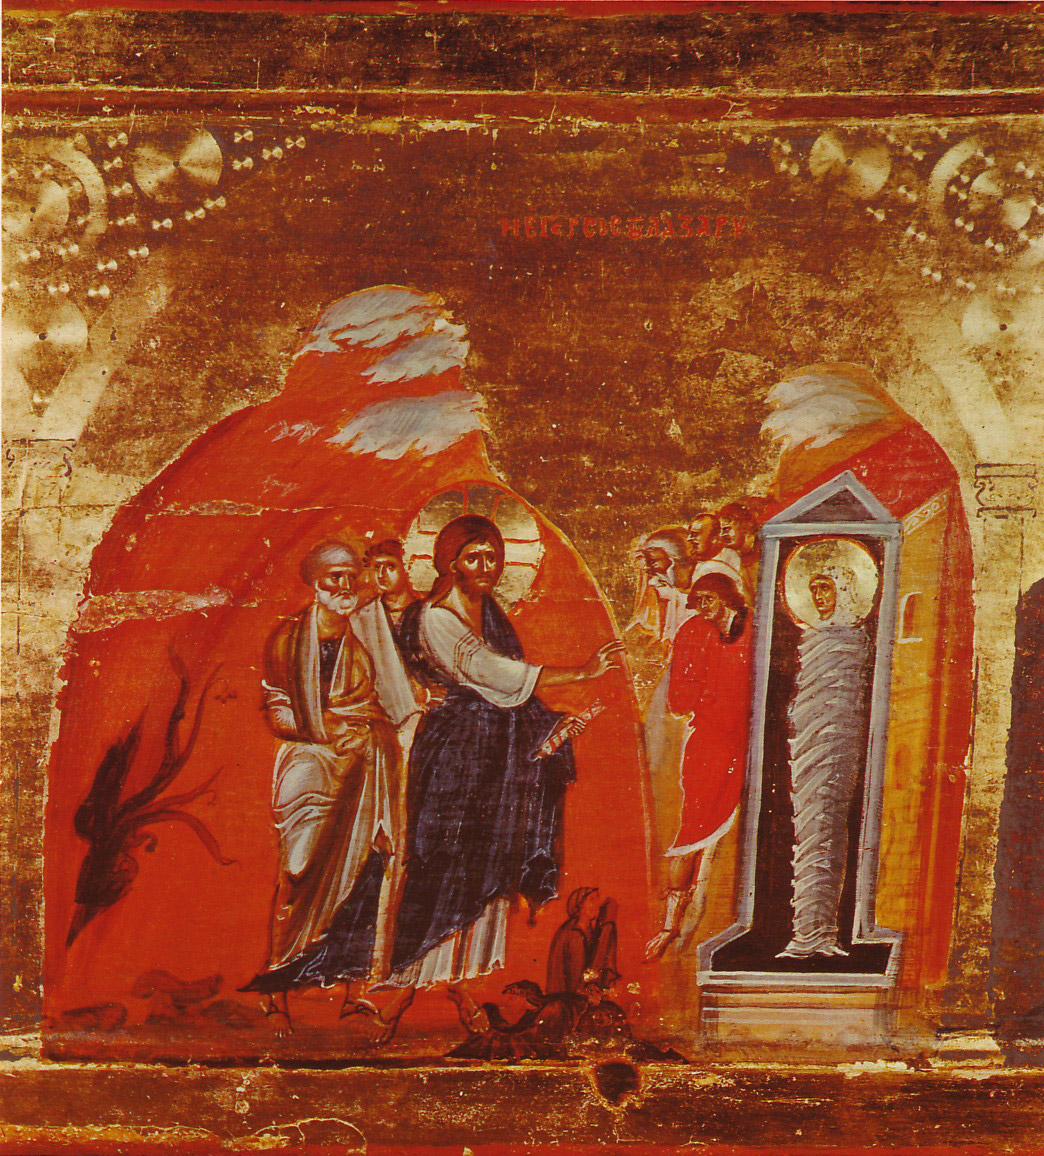 The Resurrection of Lazarus by Jesus Christ, 13th c., Mount Sinai Monastery, Egypt. Image: Wikimedia Commons.